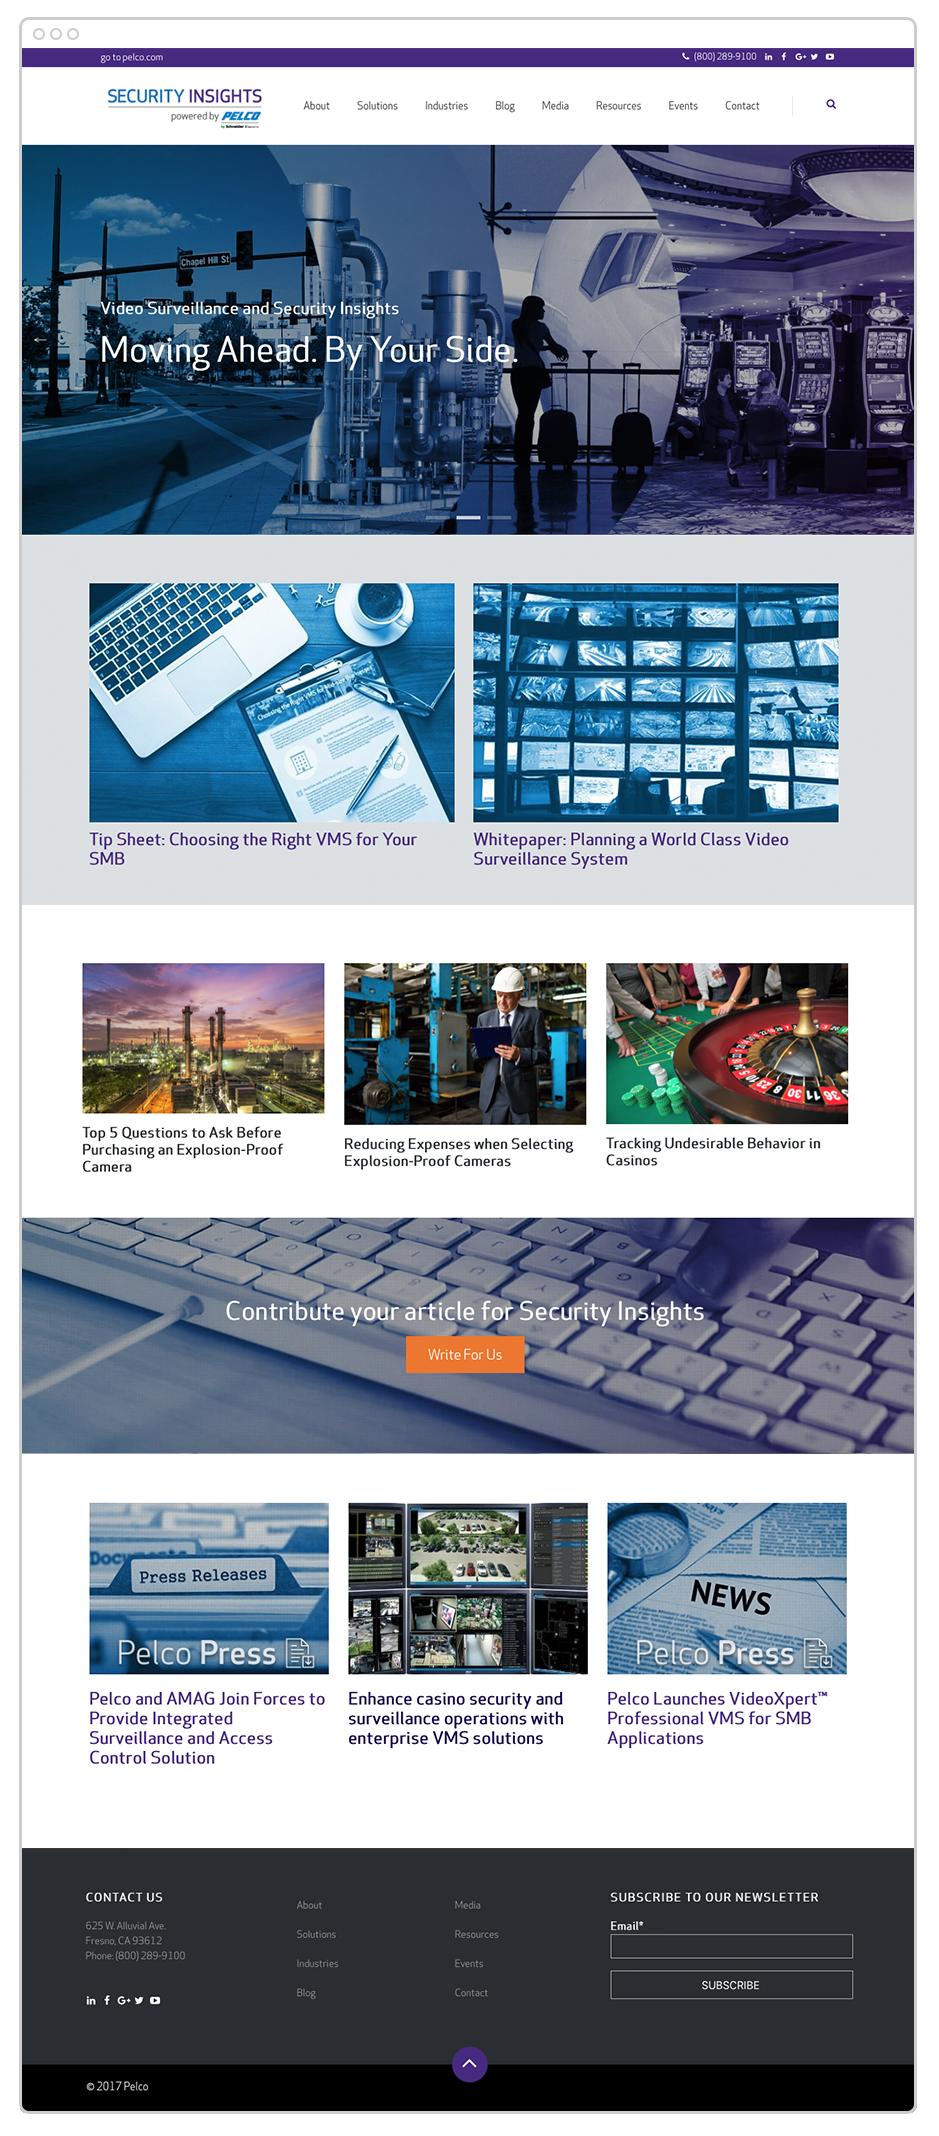 Pelco_website.jpg